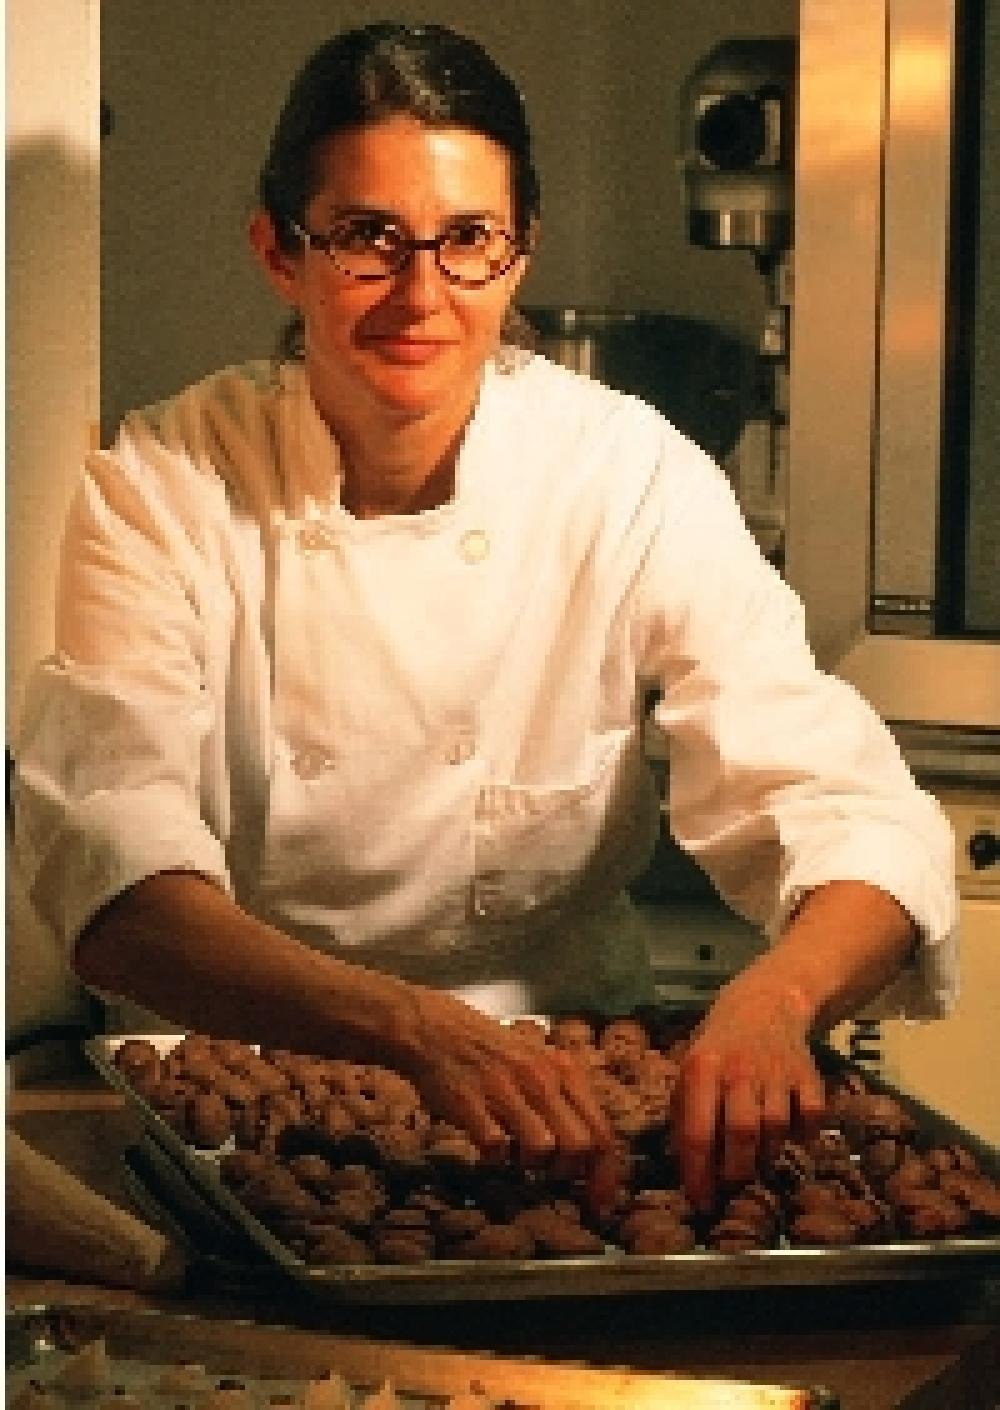 Kerstin Kleber, Pastry Chef, McCradys, Charleston, S.C.